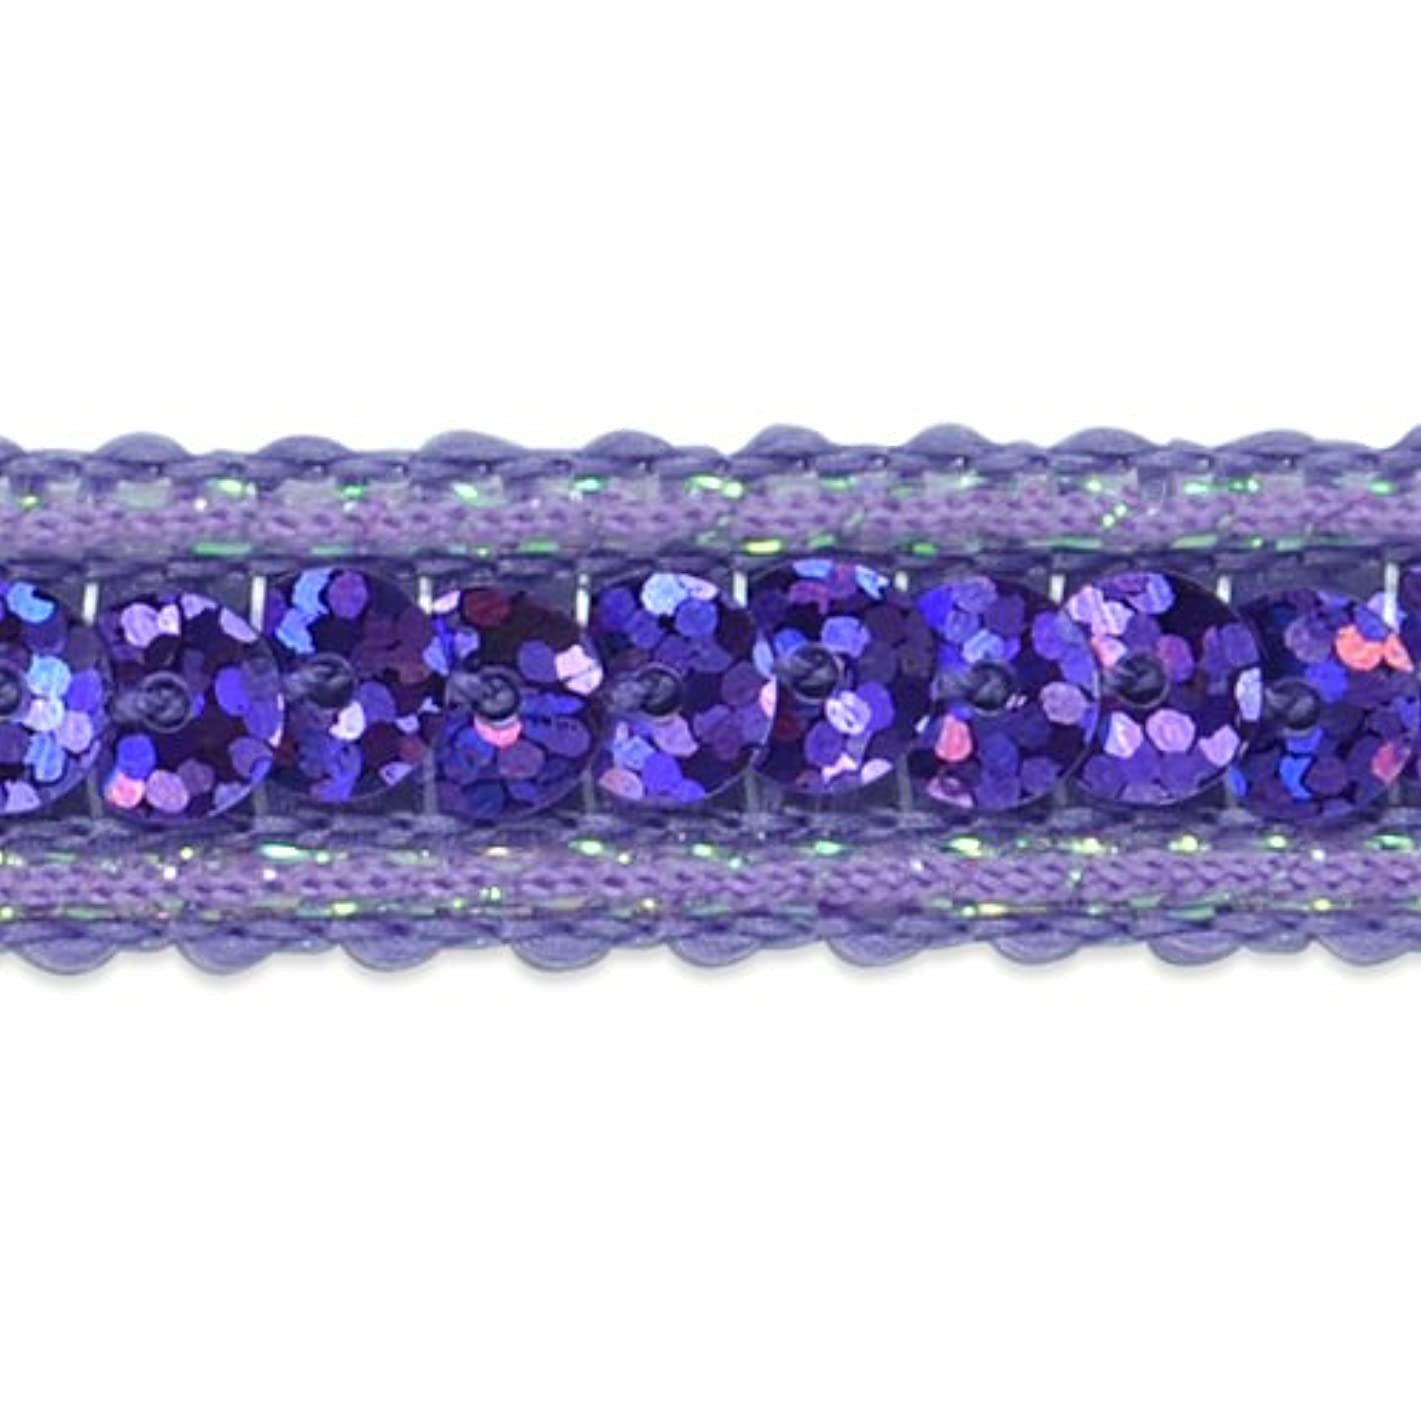 Expo International Single Row Sequin with Sparkle Edge Trim, 20-Yard, Purple